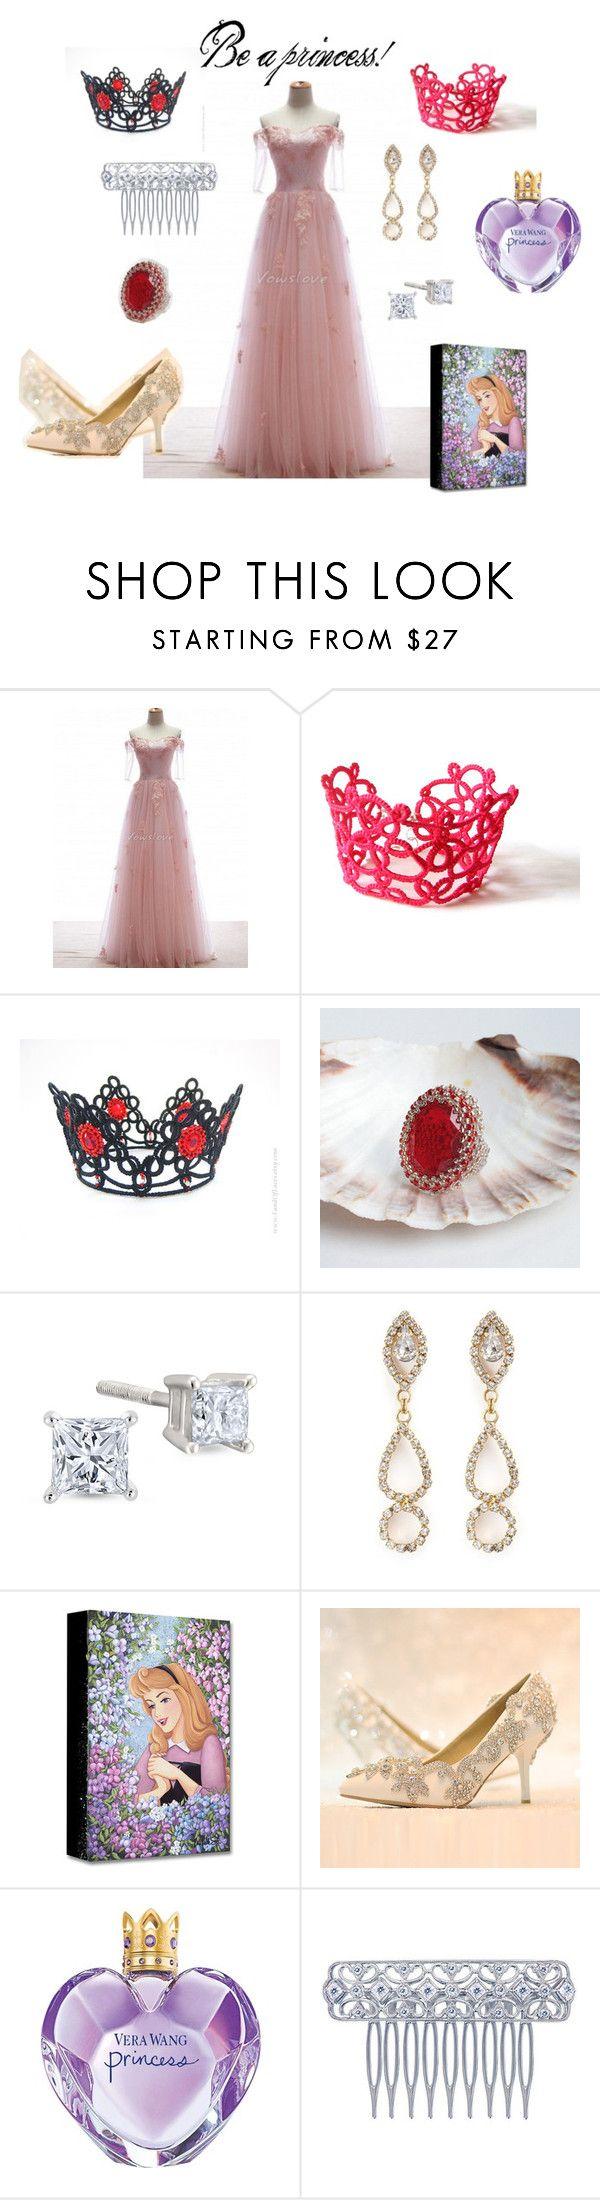 """Be a princess!"" by marudafelting ❤ liked on Polyvore featuring Erickson Beamon, Vera Wang, princess, diamonds, shine, LandOfLaces and shinyjewelry"